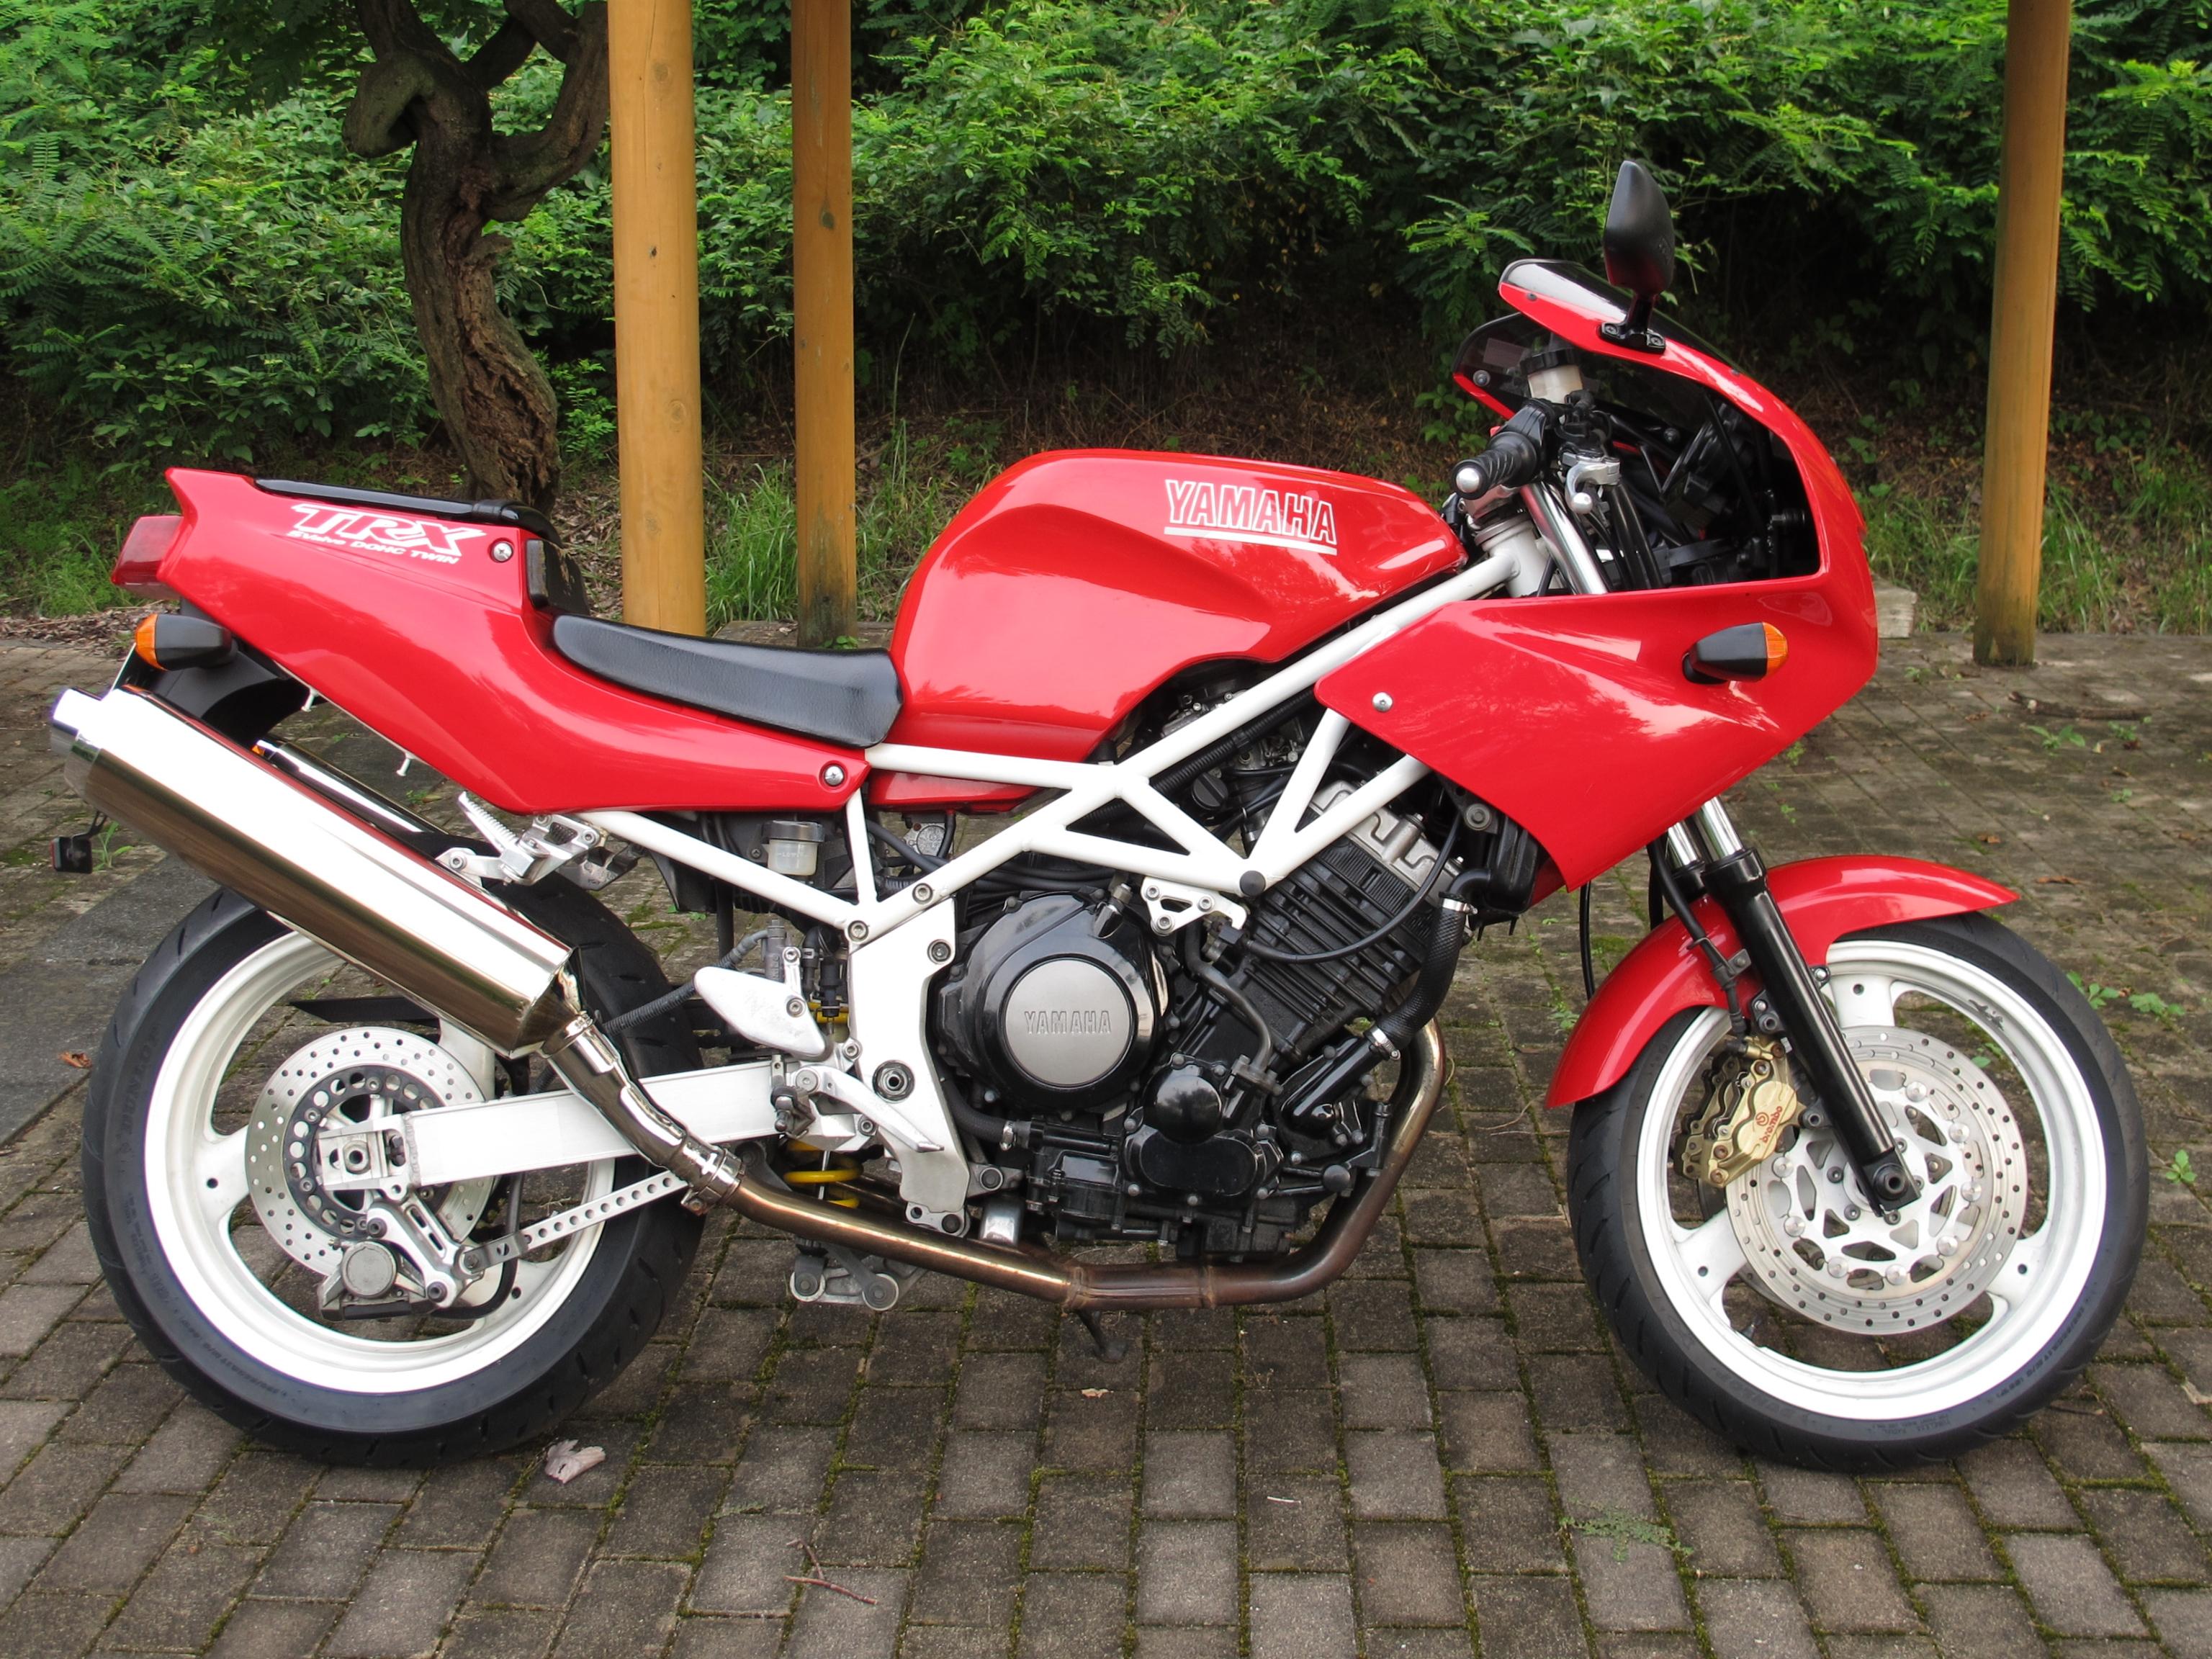 Is The Yamaha Raider A Big Bike